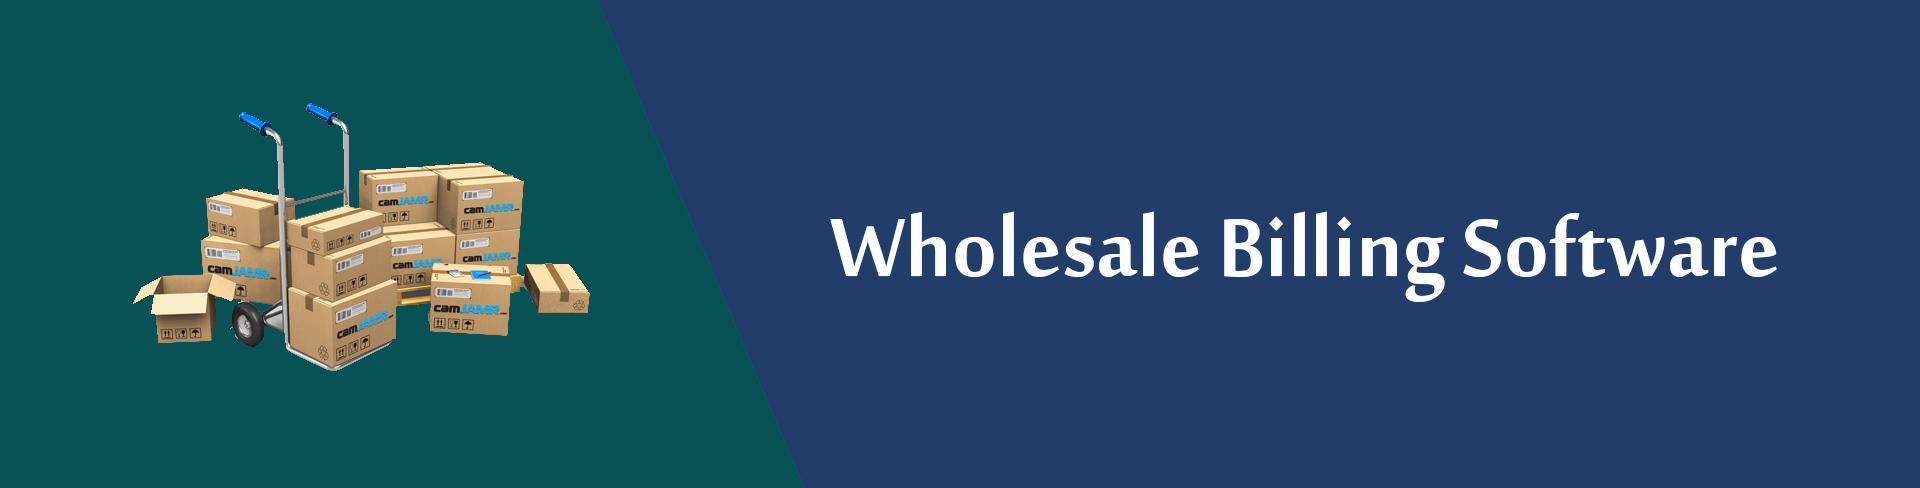 Wholesale Billing Software